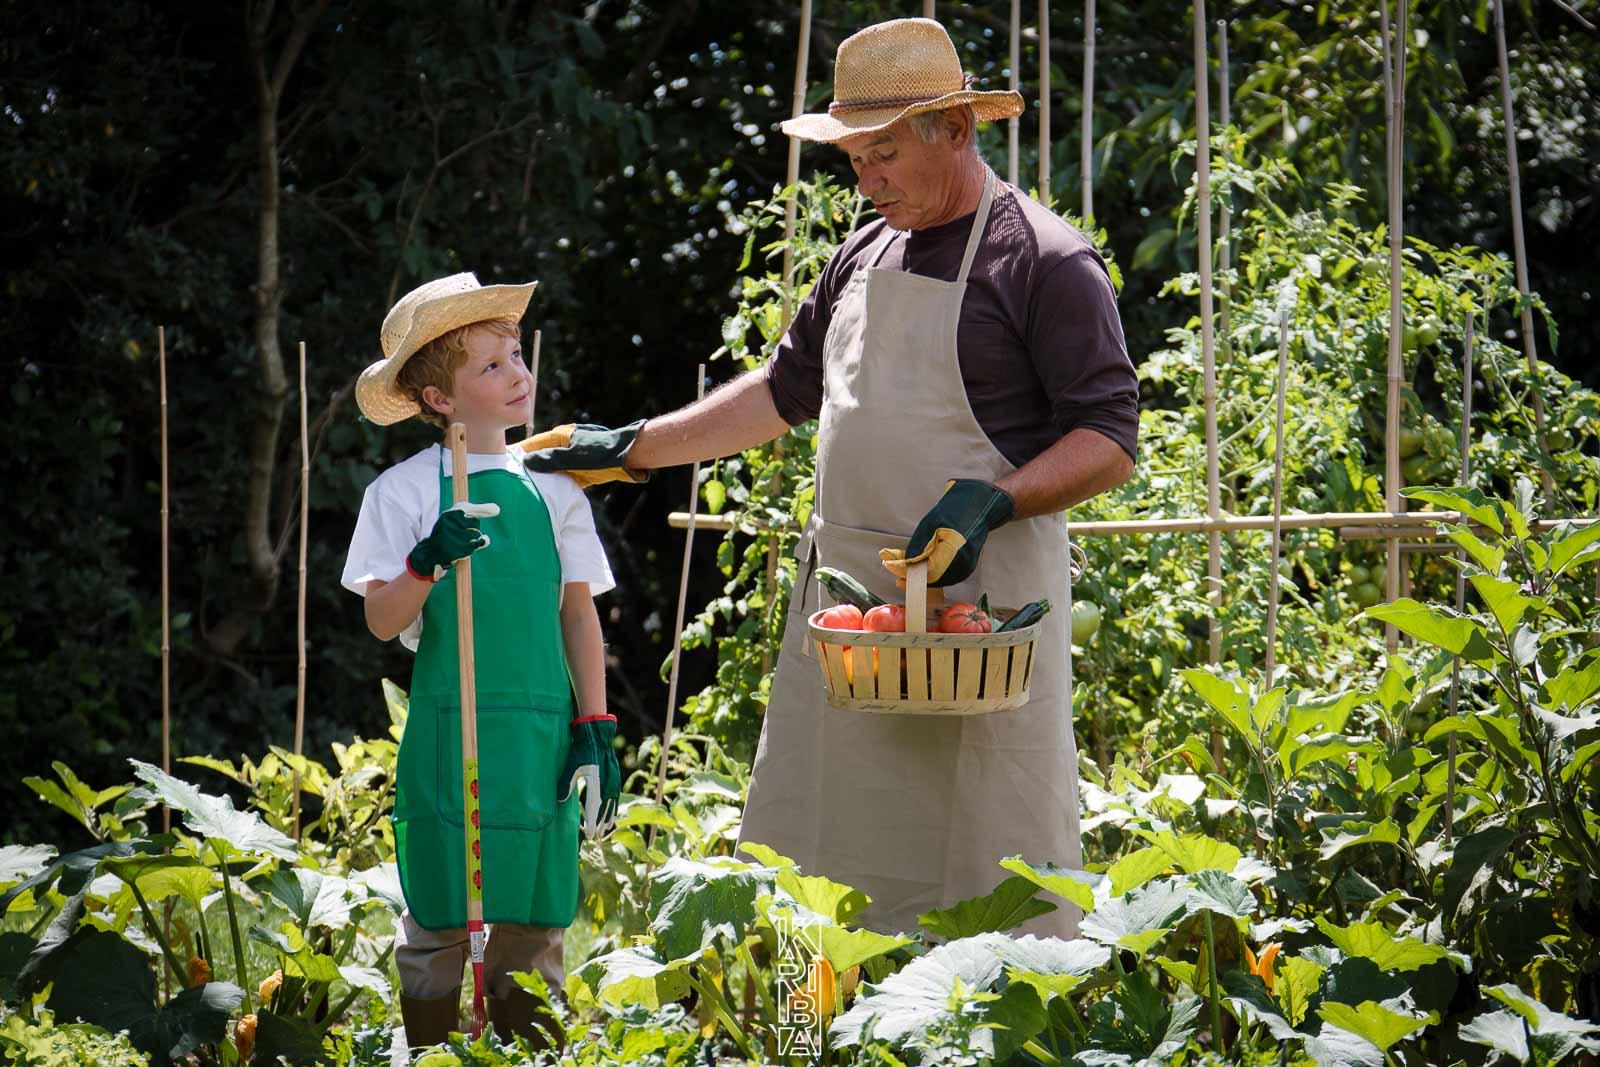 001-planjardin-jardinier&enfants.jpg